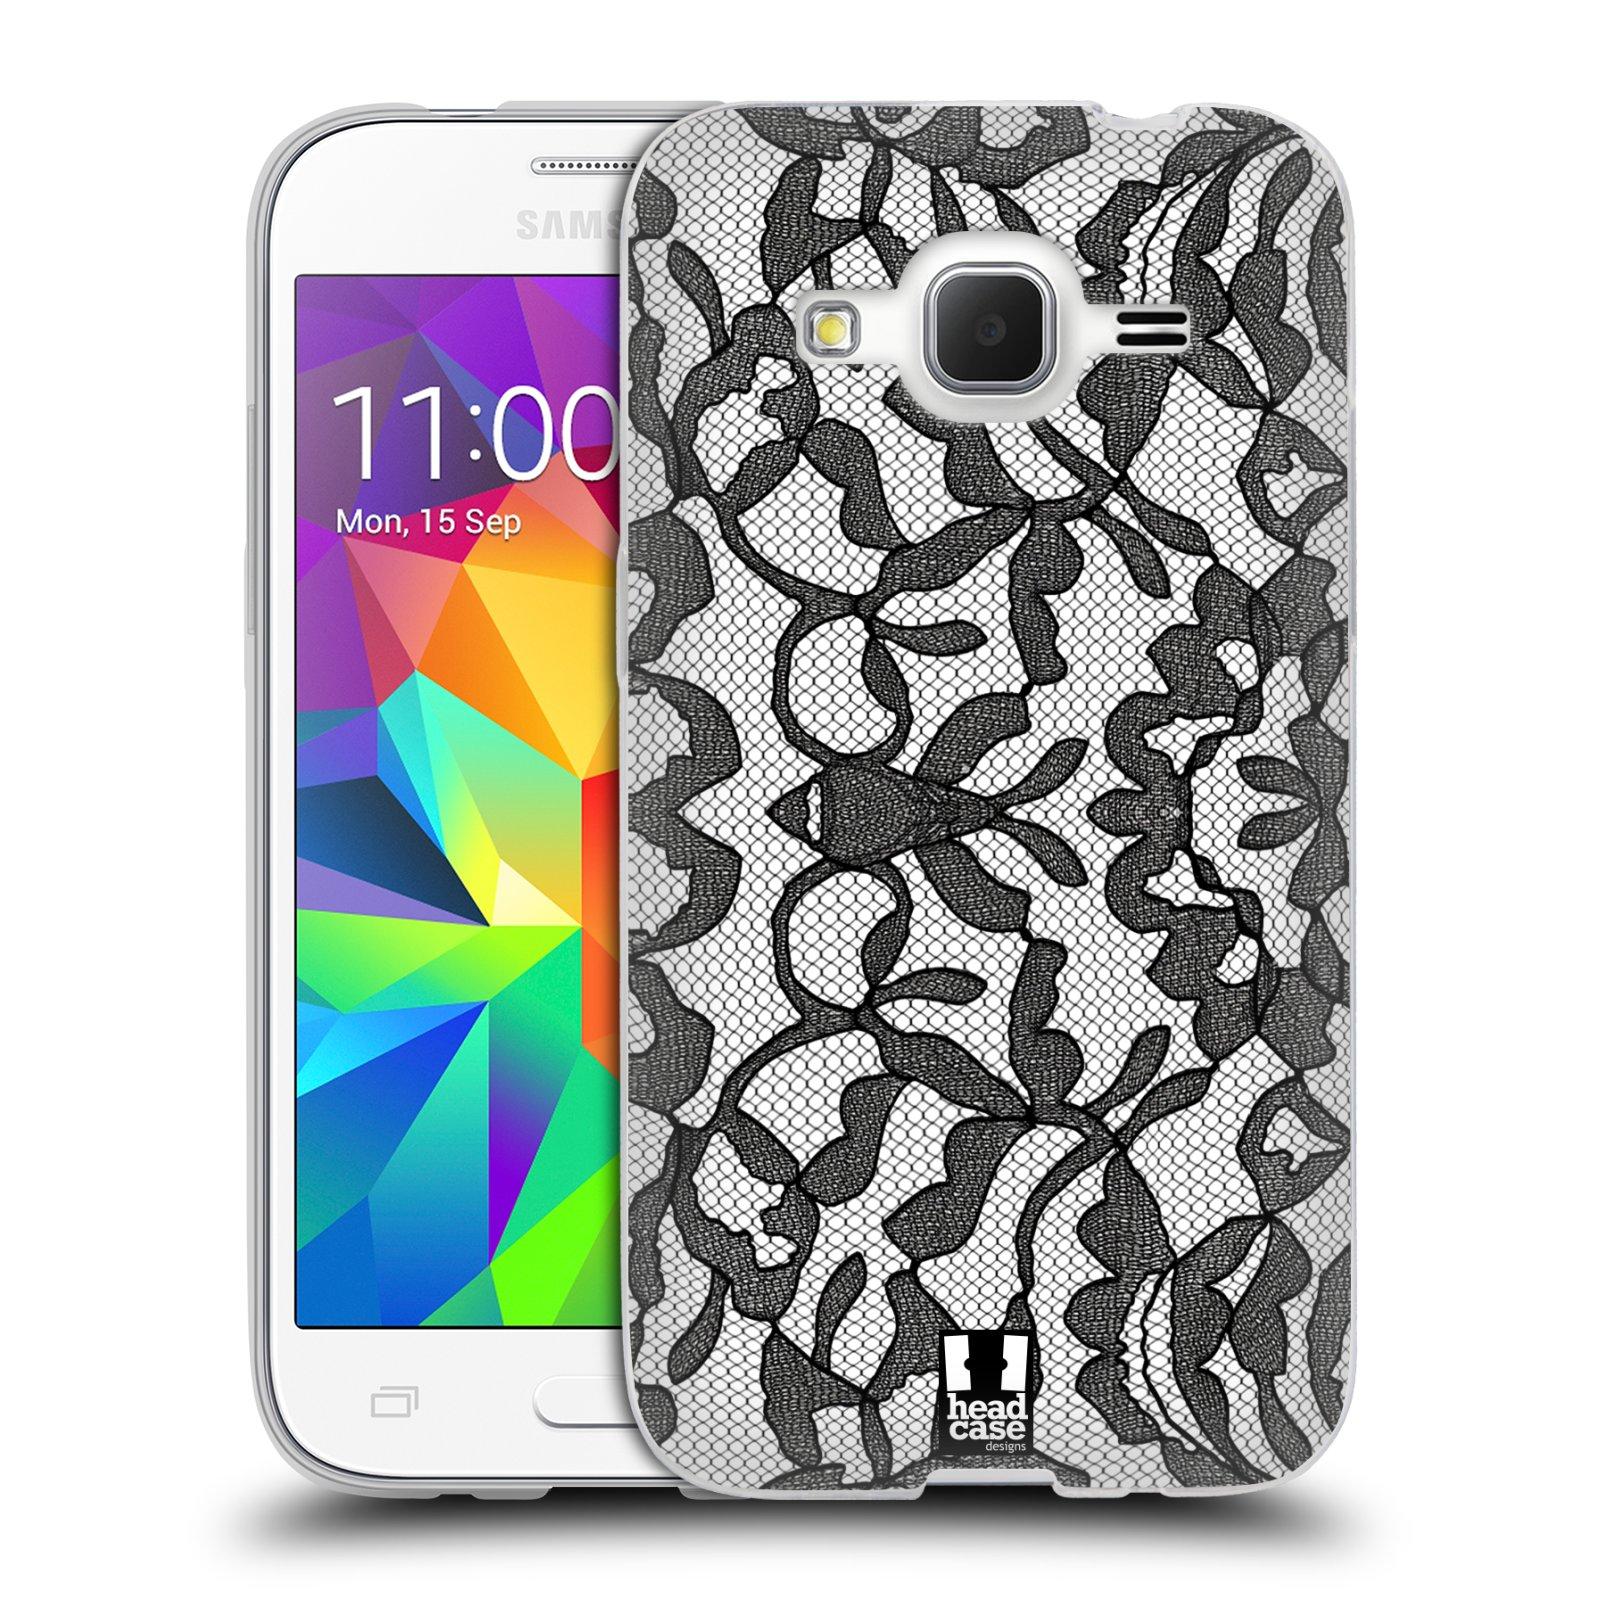 Silikonové pouzdro na mobil Samsung Galaxy Core Prime LTE HEAD CASE LEAFY KRAJKA